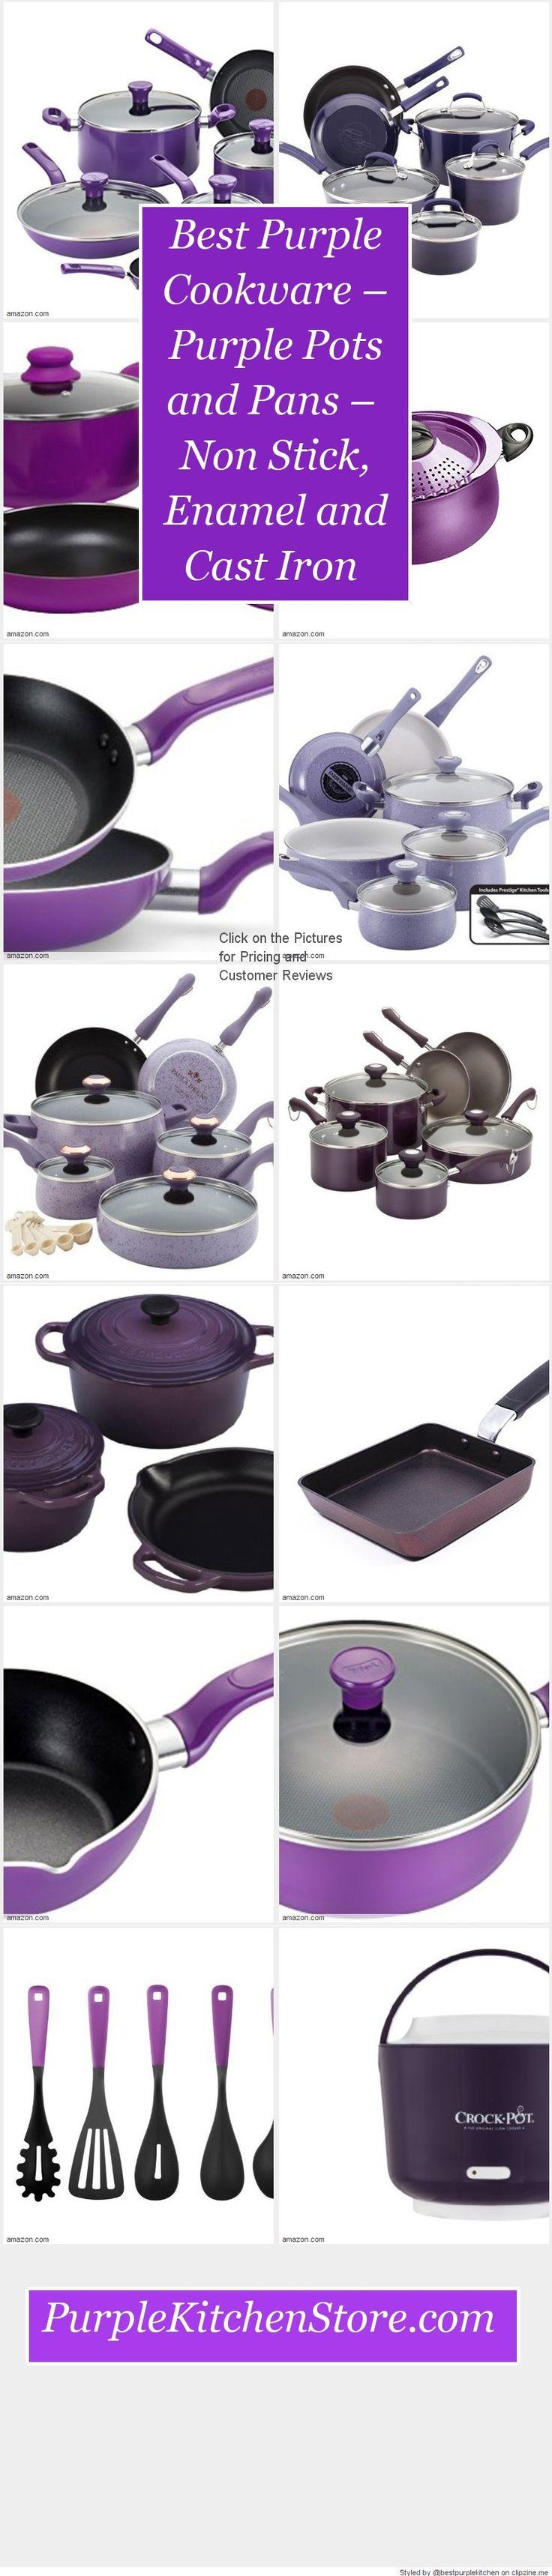 Best Purple Cookware – Purple Pots and Pans –Non Stick, Enamel and Cast Iron #PurpleKitchenStore #PurpleCookwareSetspks